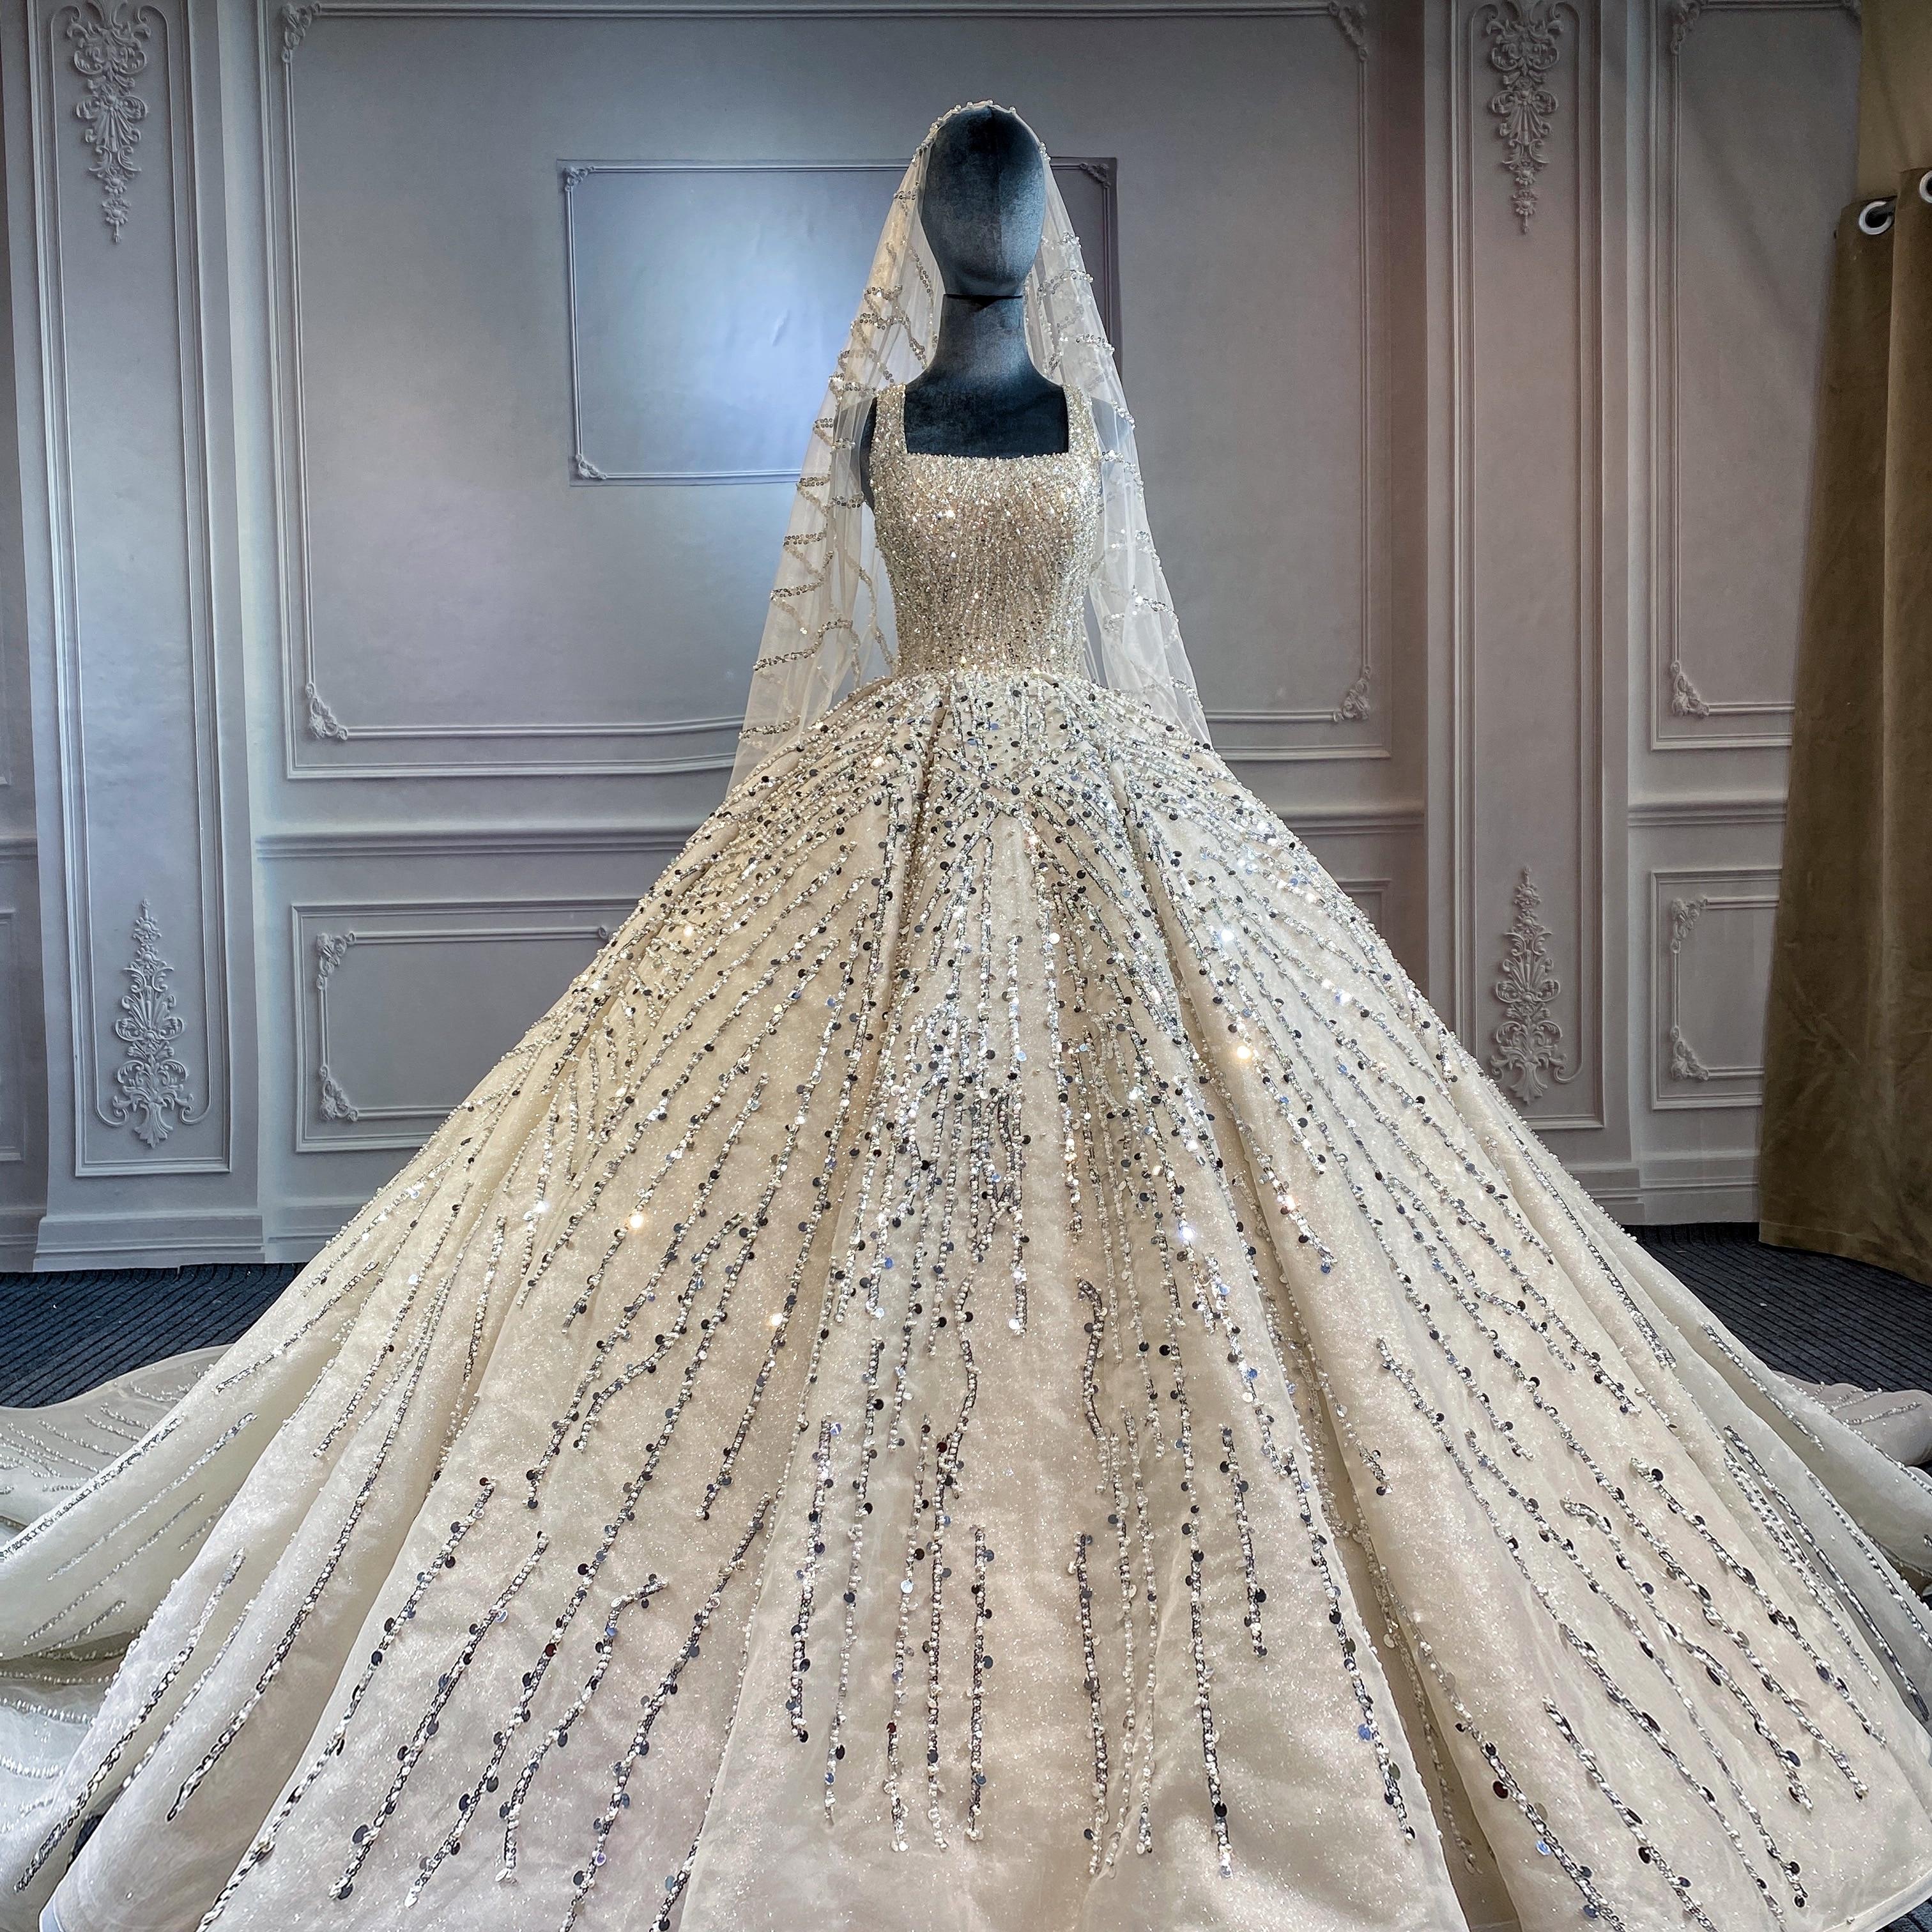 Marnham Princess Lace Strap Wedding Dress For Bride 2021 Sleeveless Ball Gown Bridal Dresses